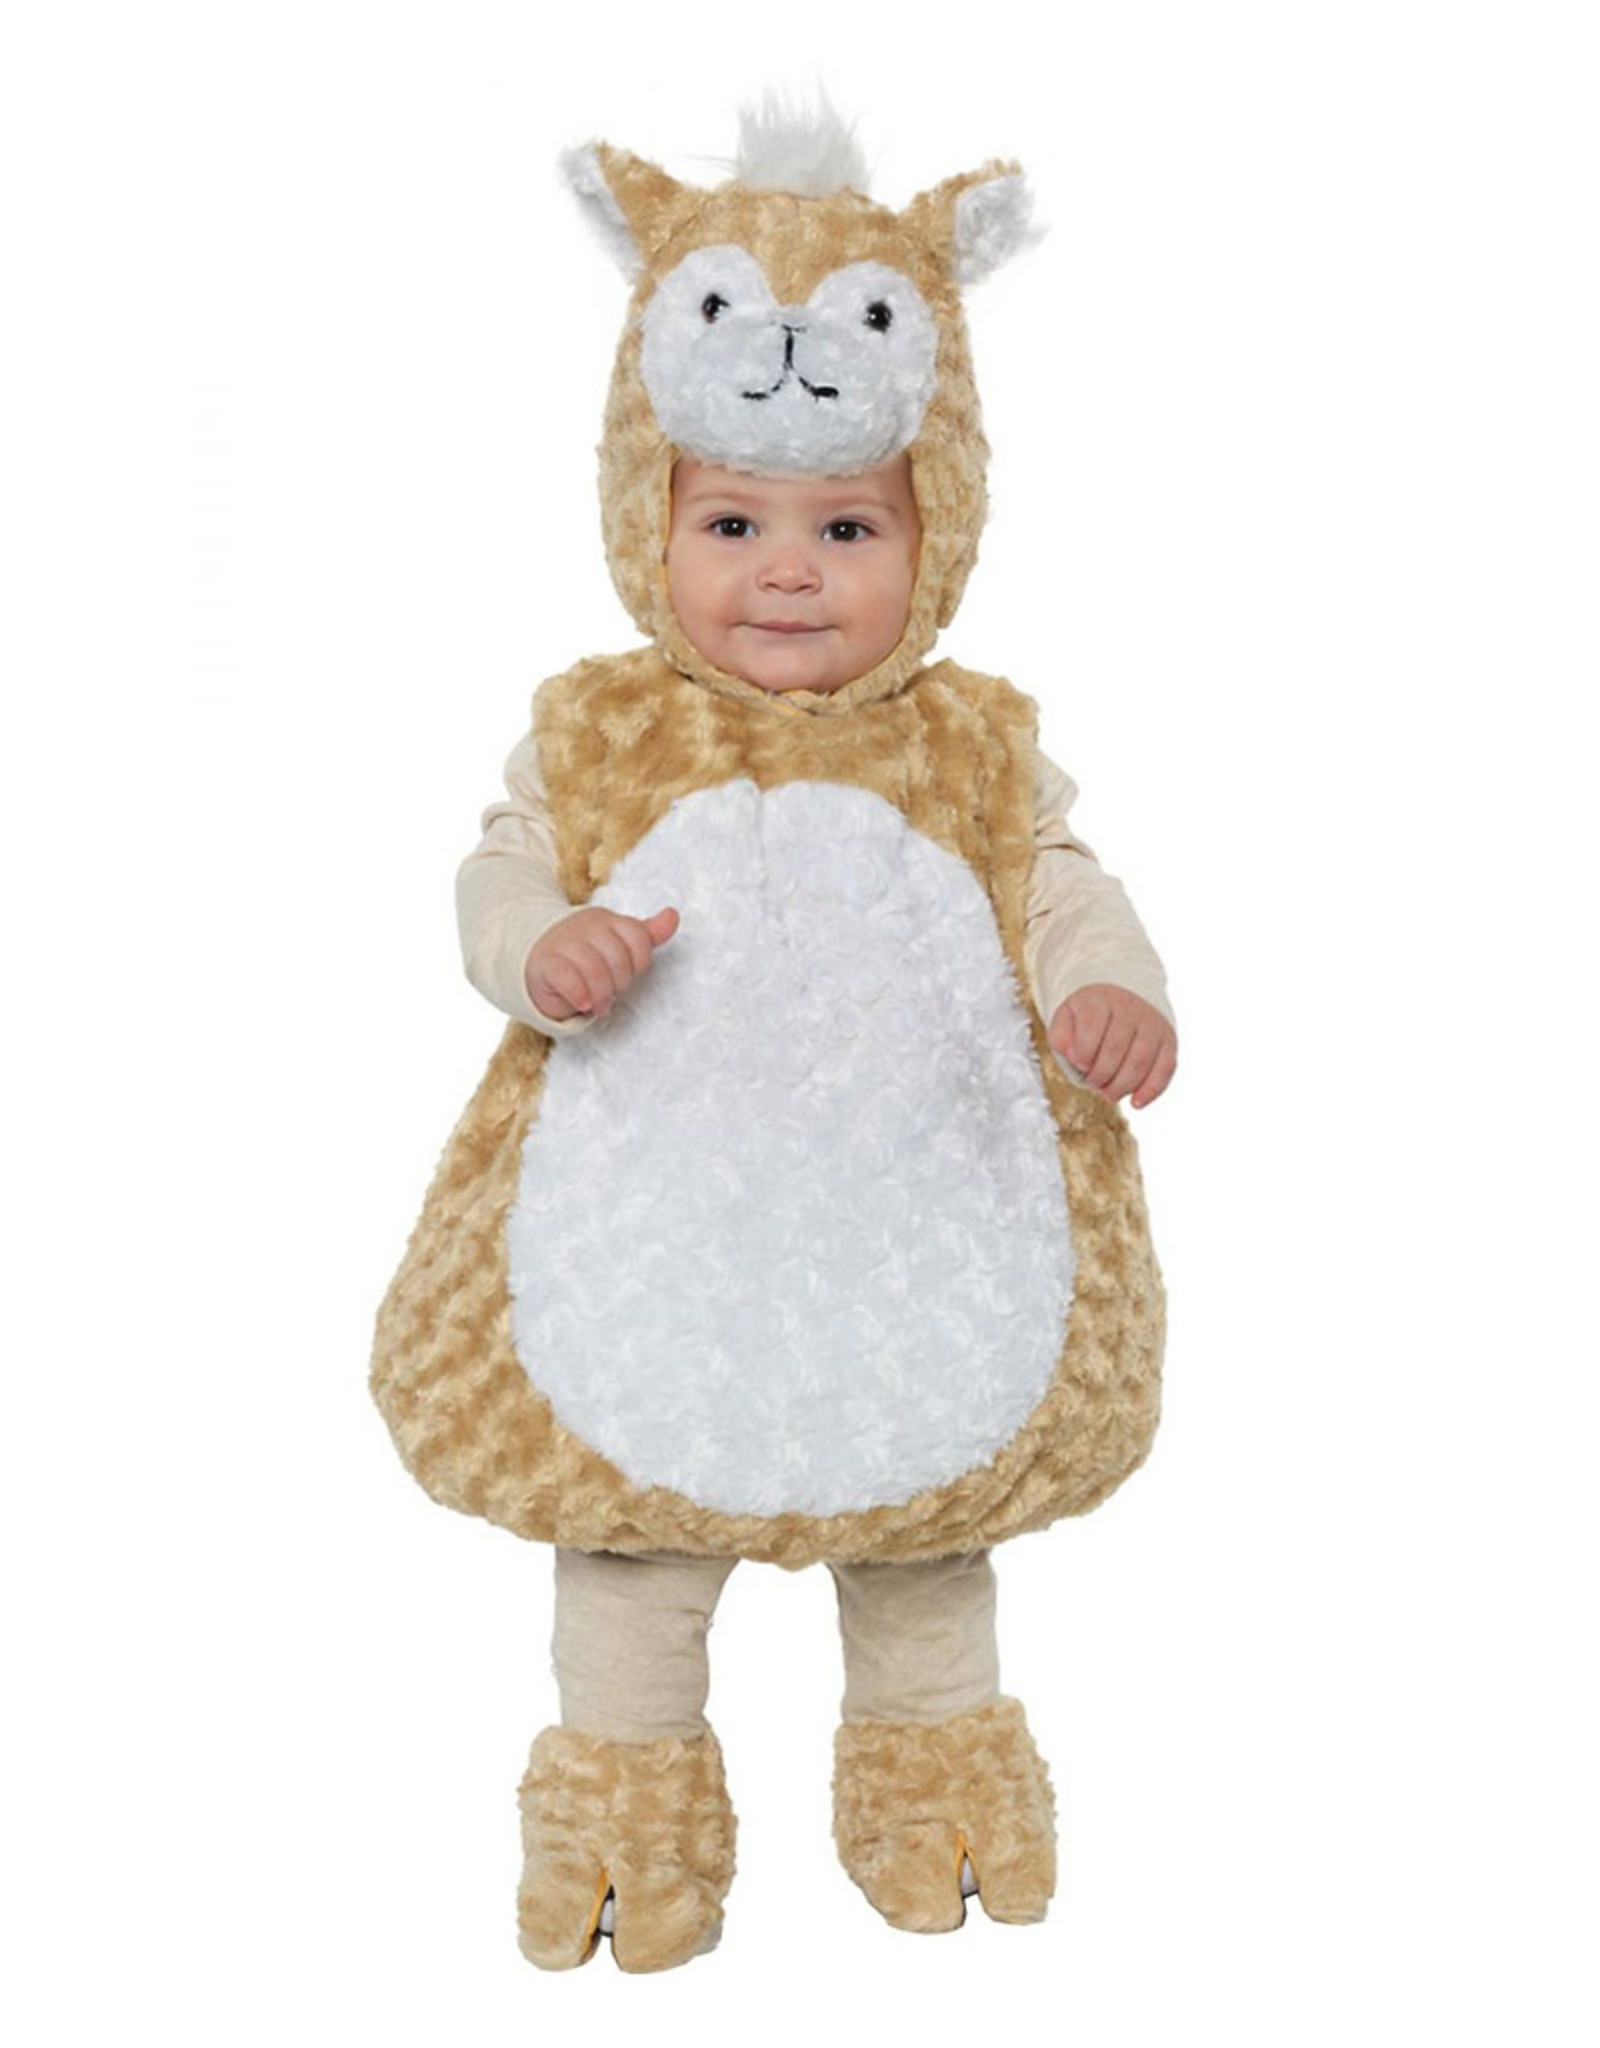 UNDERWRAPS Llama Belly Baby - Toddler